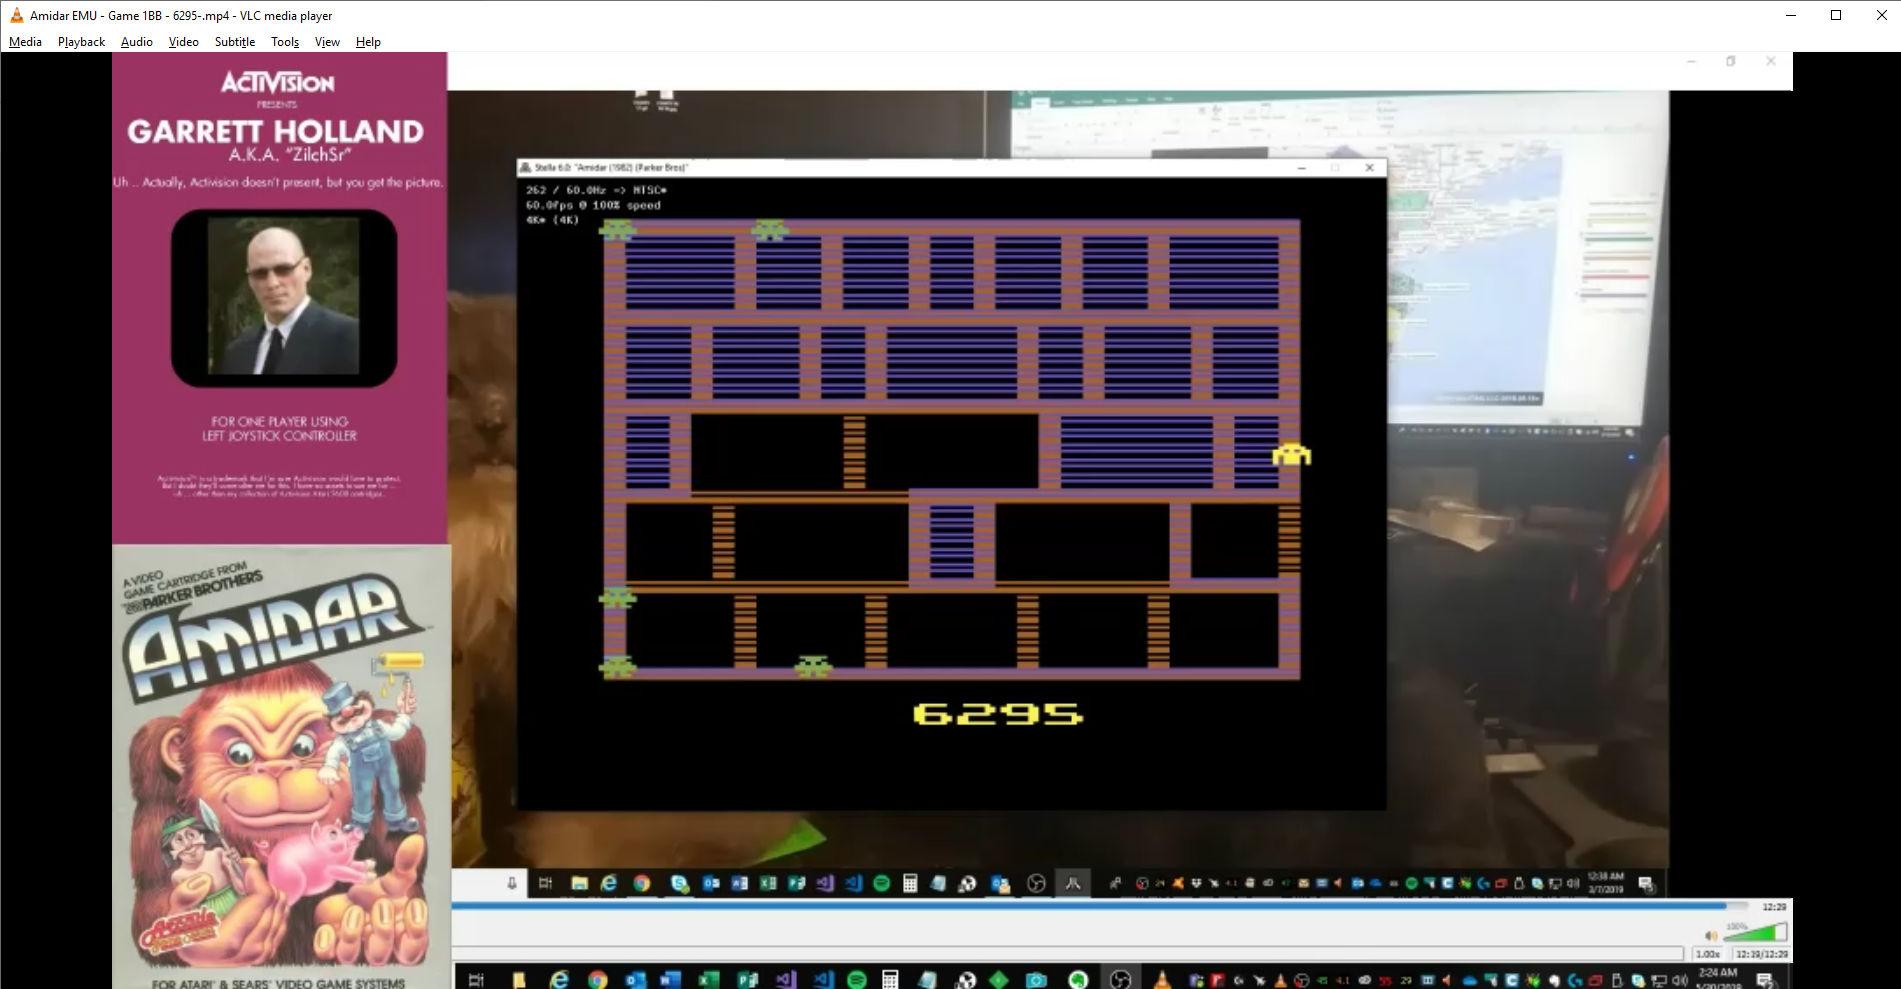 ZilchSr: Amidar (Atari 2600 Emulated Novice/B Mode) 6,295 points on 2019-05-30 01:46:40